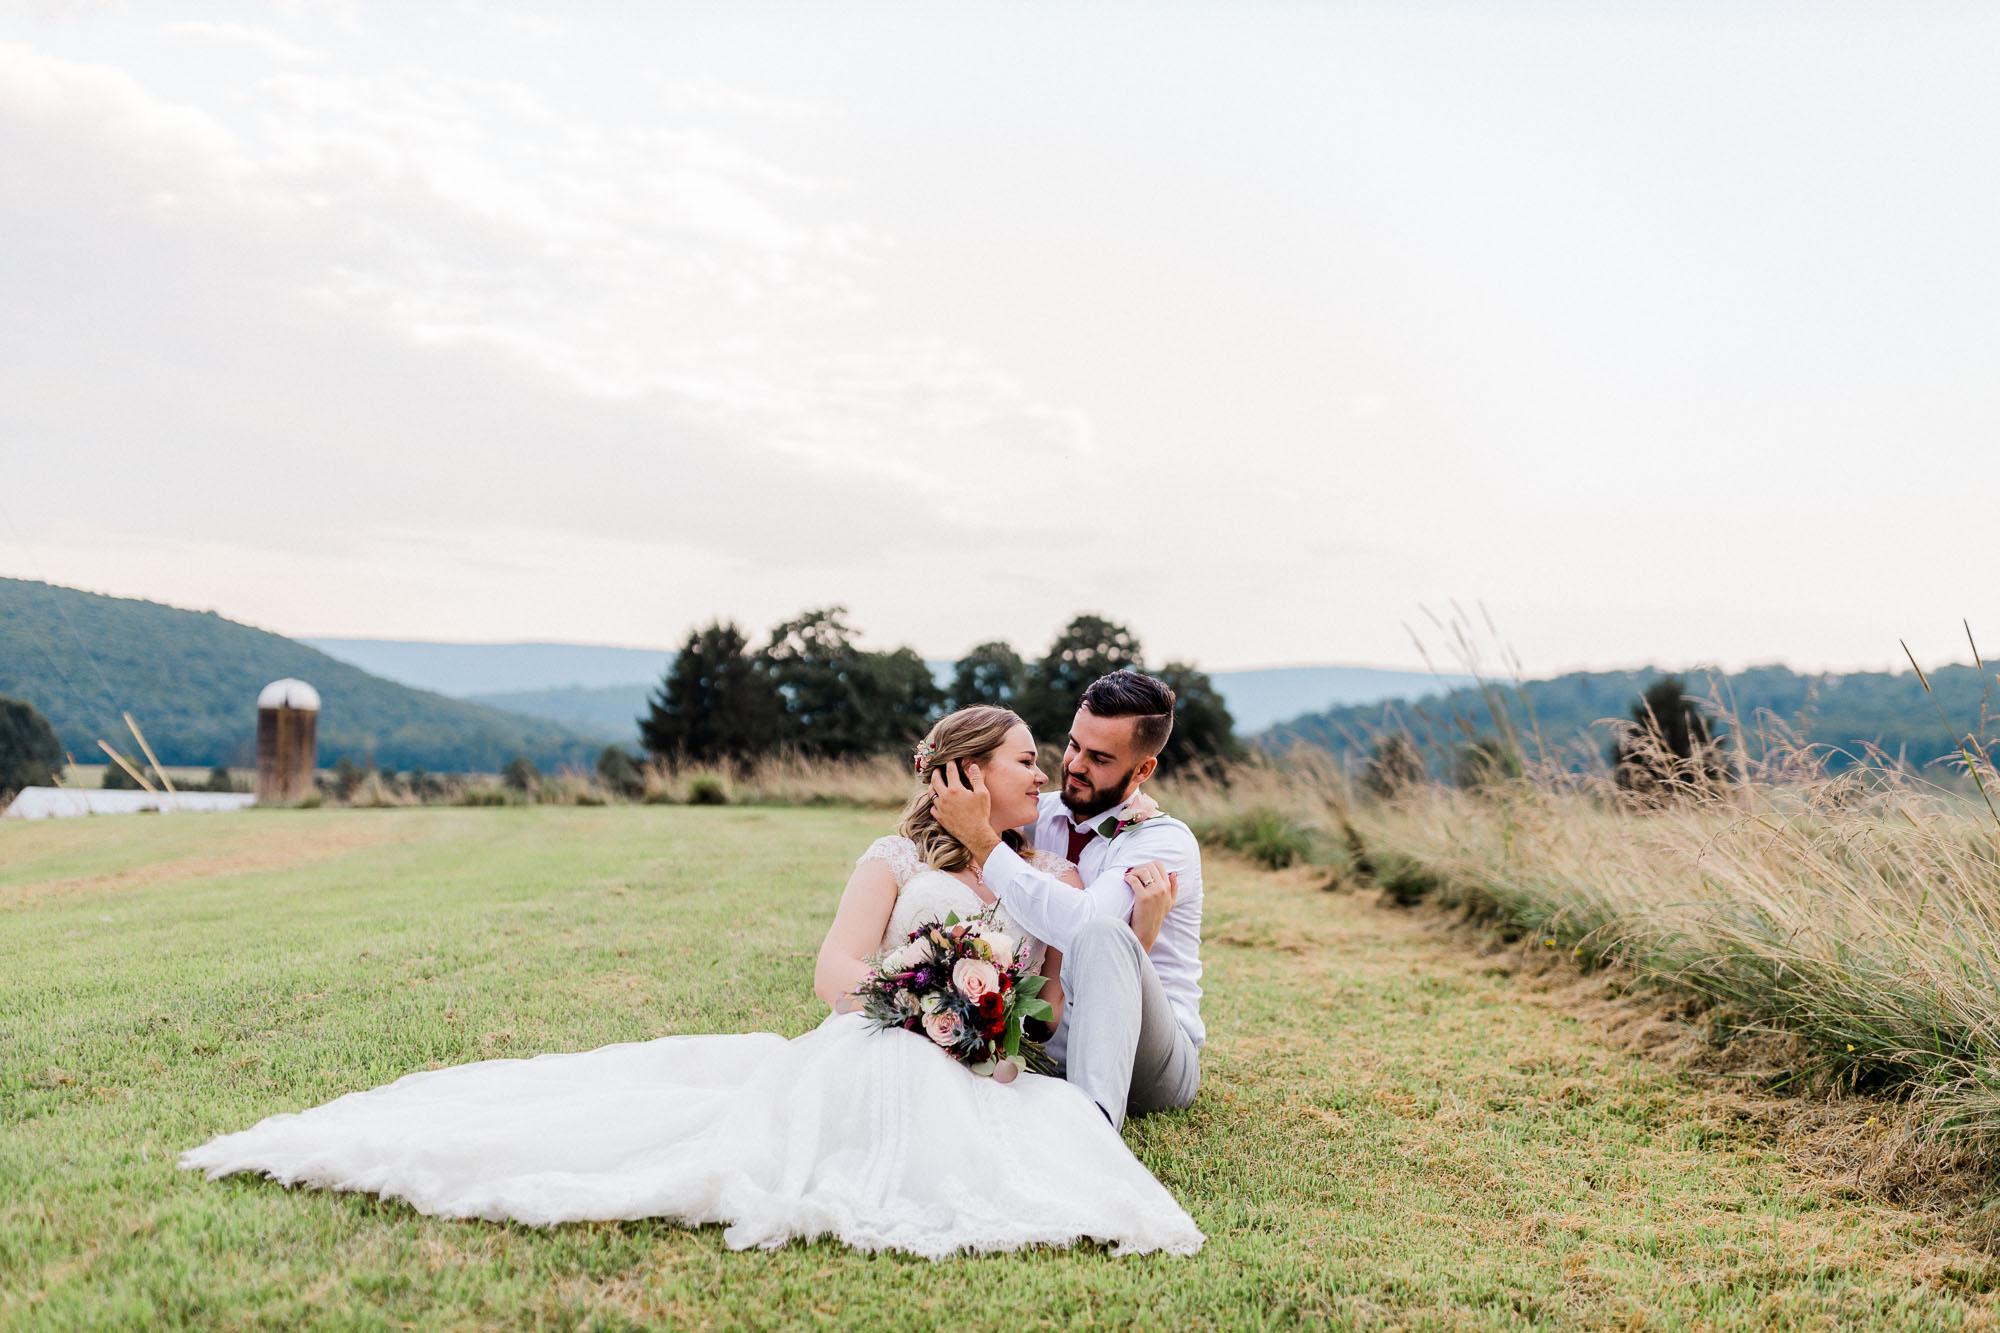 Stillwater-Christian_Church_Wedding-2380.jpg